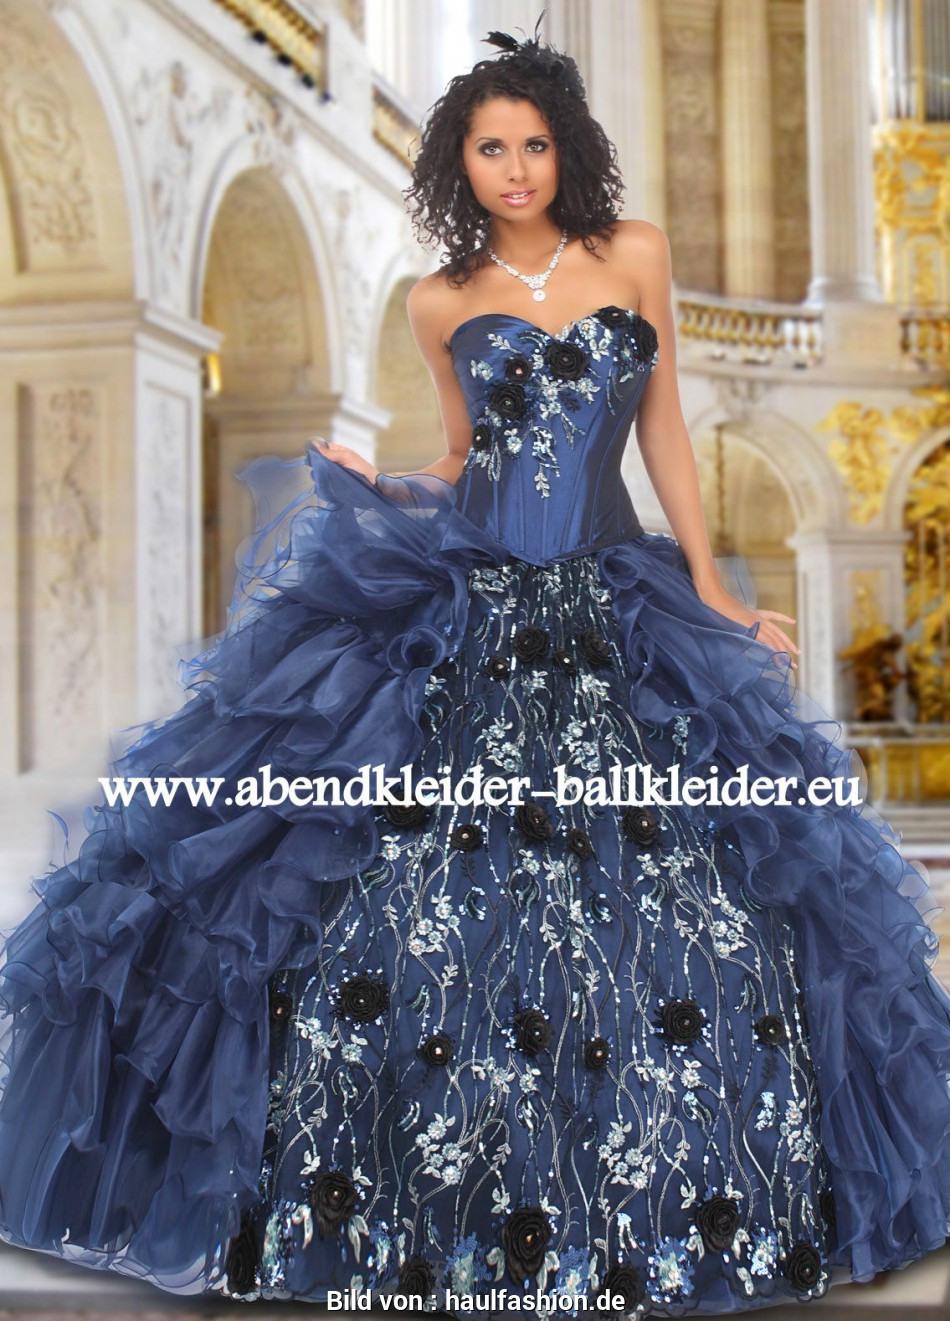 15 Coolste Abendkleid Umstand GalerieFormal Genial Abendkleid Umstand Design